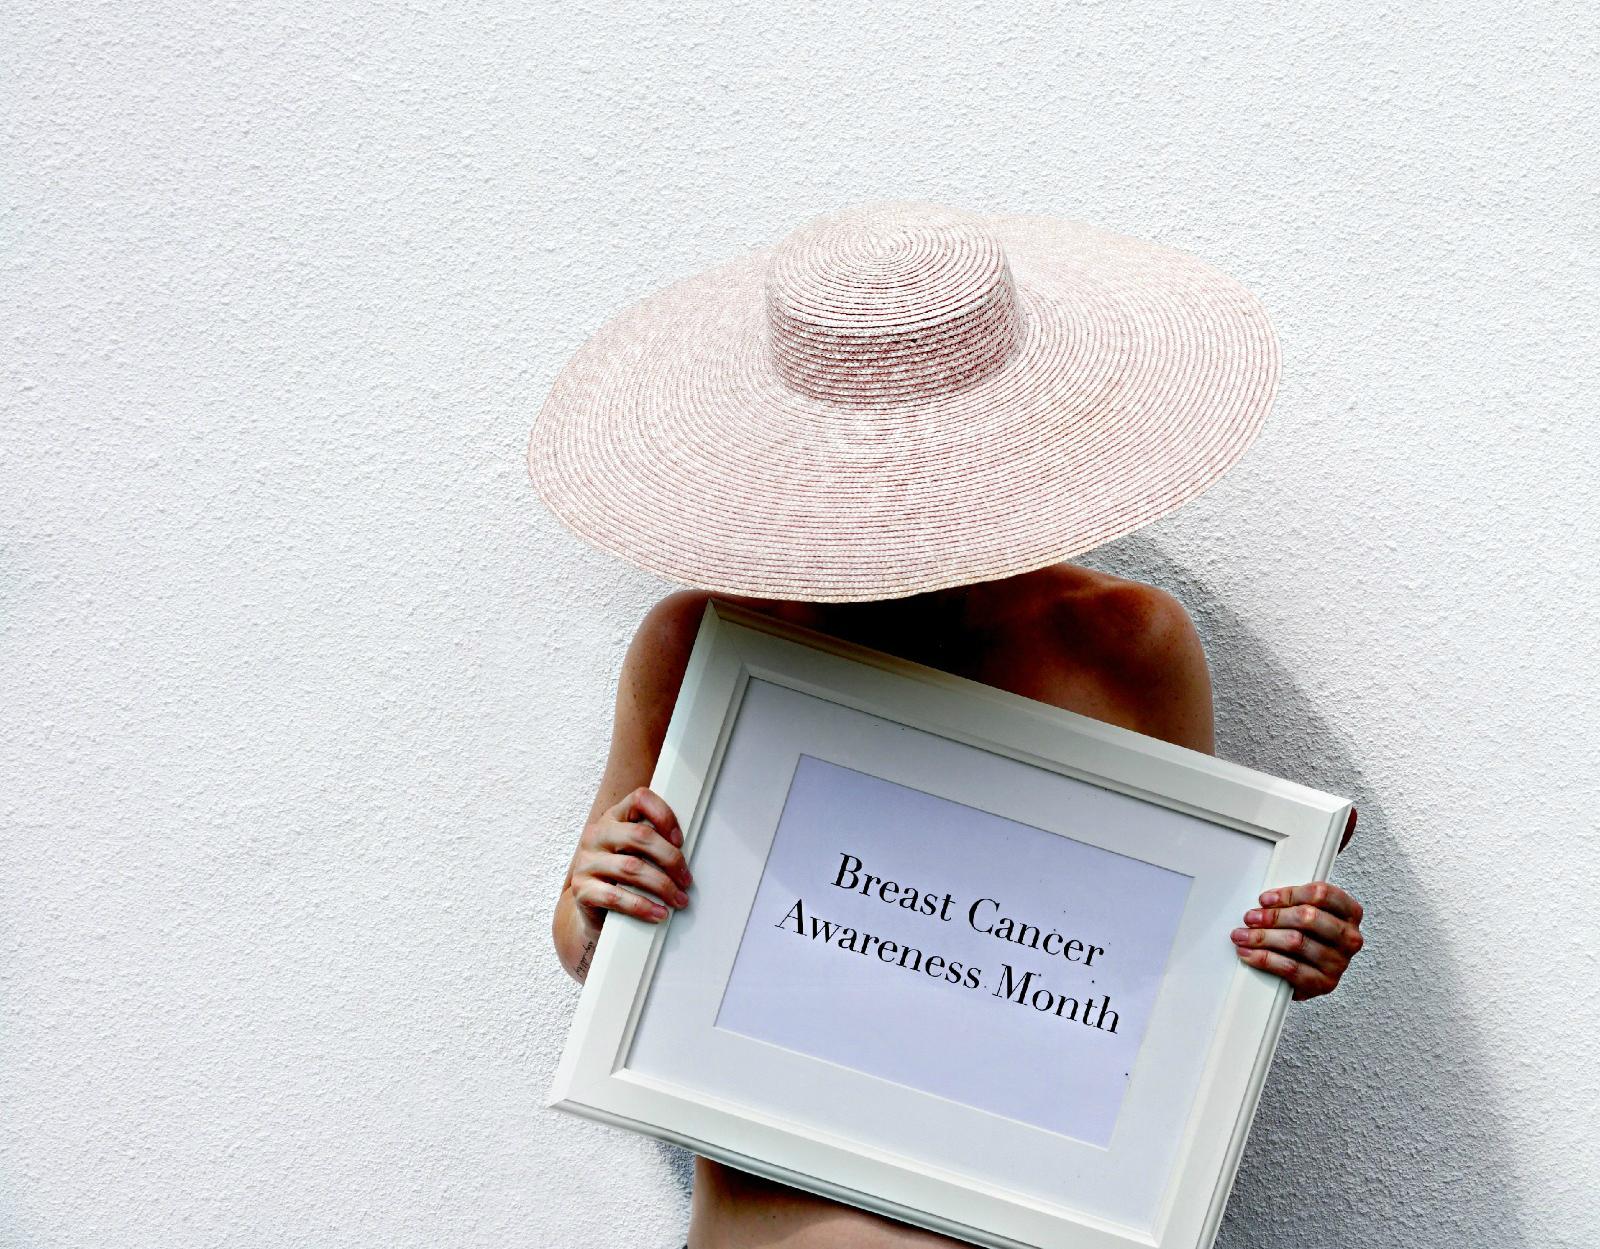 Breast Cancer Awareness Month Jo Lorenz